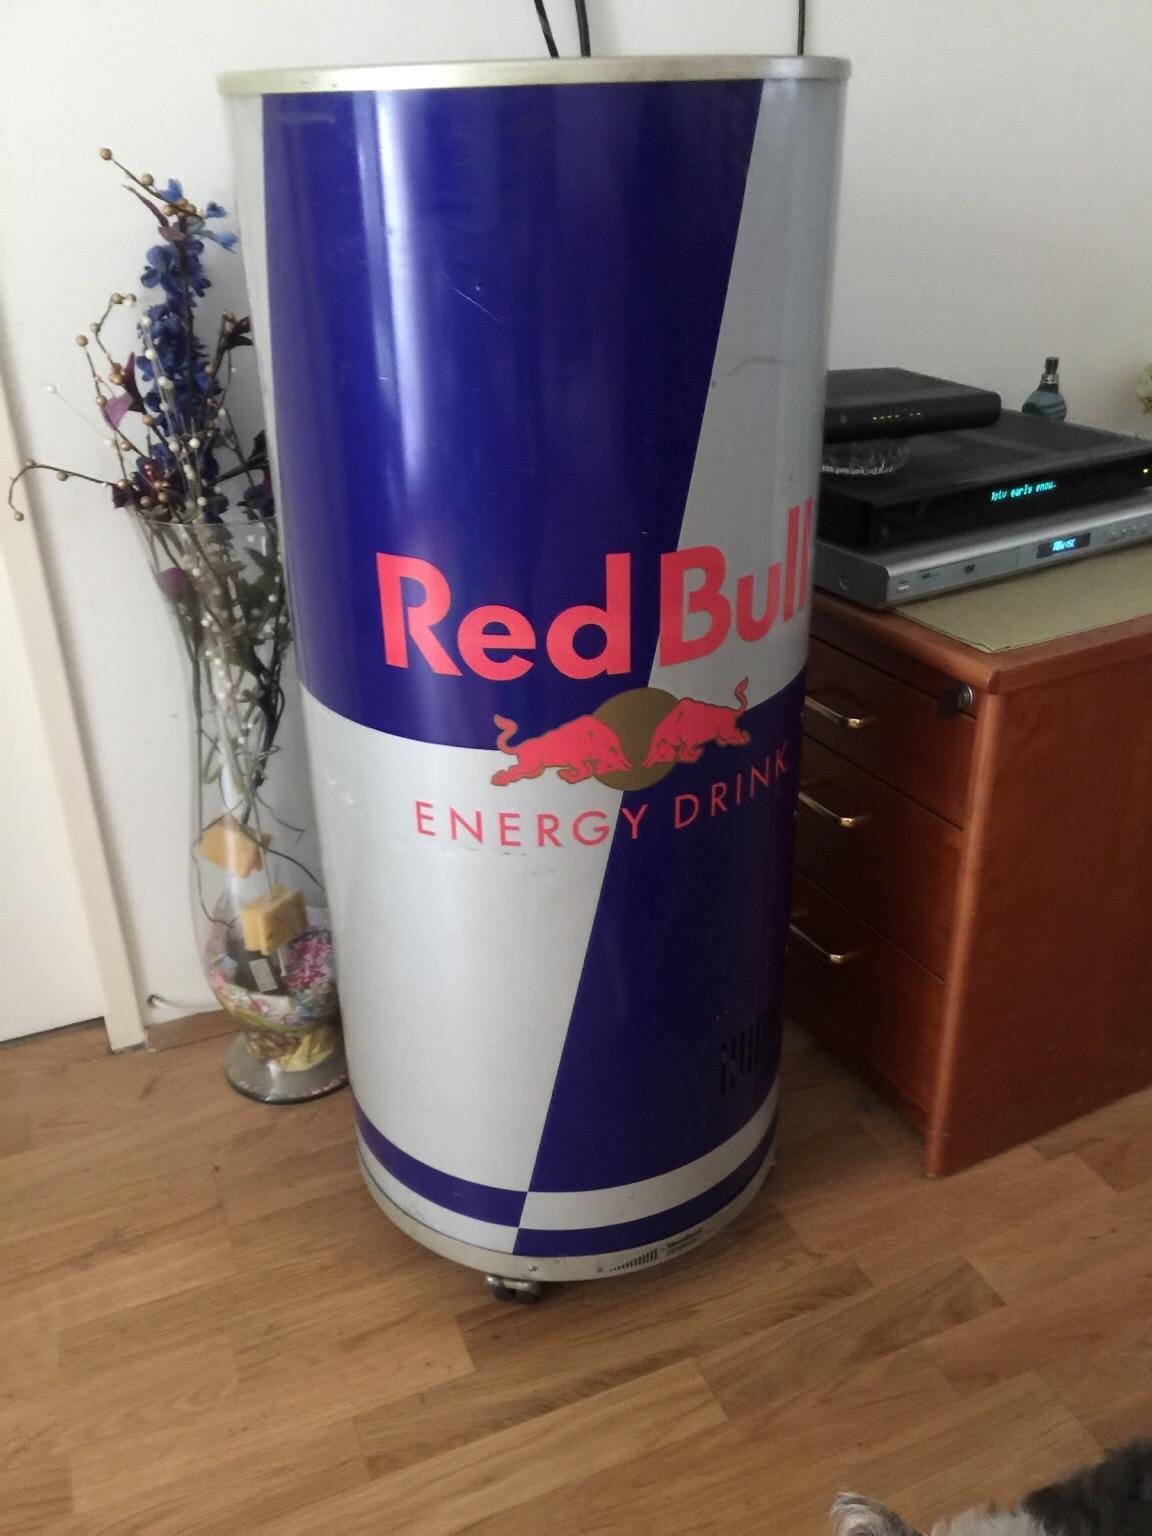 Red Bull Kühlschrank Folie : Gebraucht verkaufe redbull kühlschrank in wien um u ac